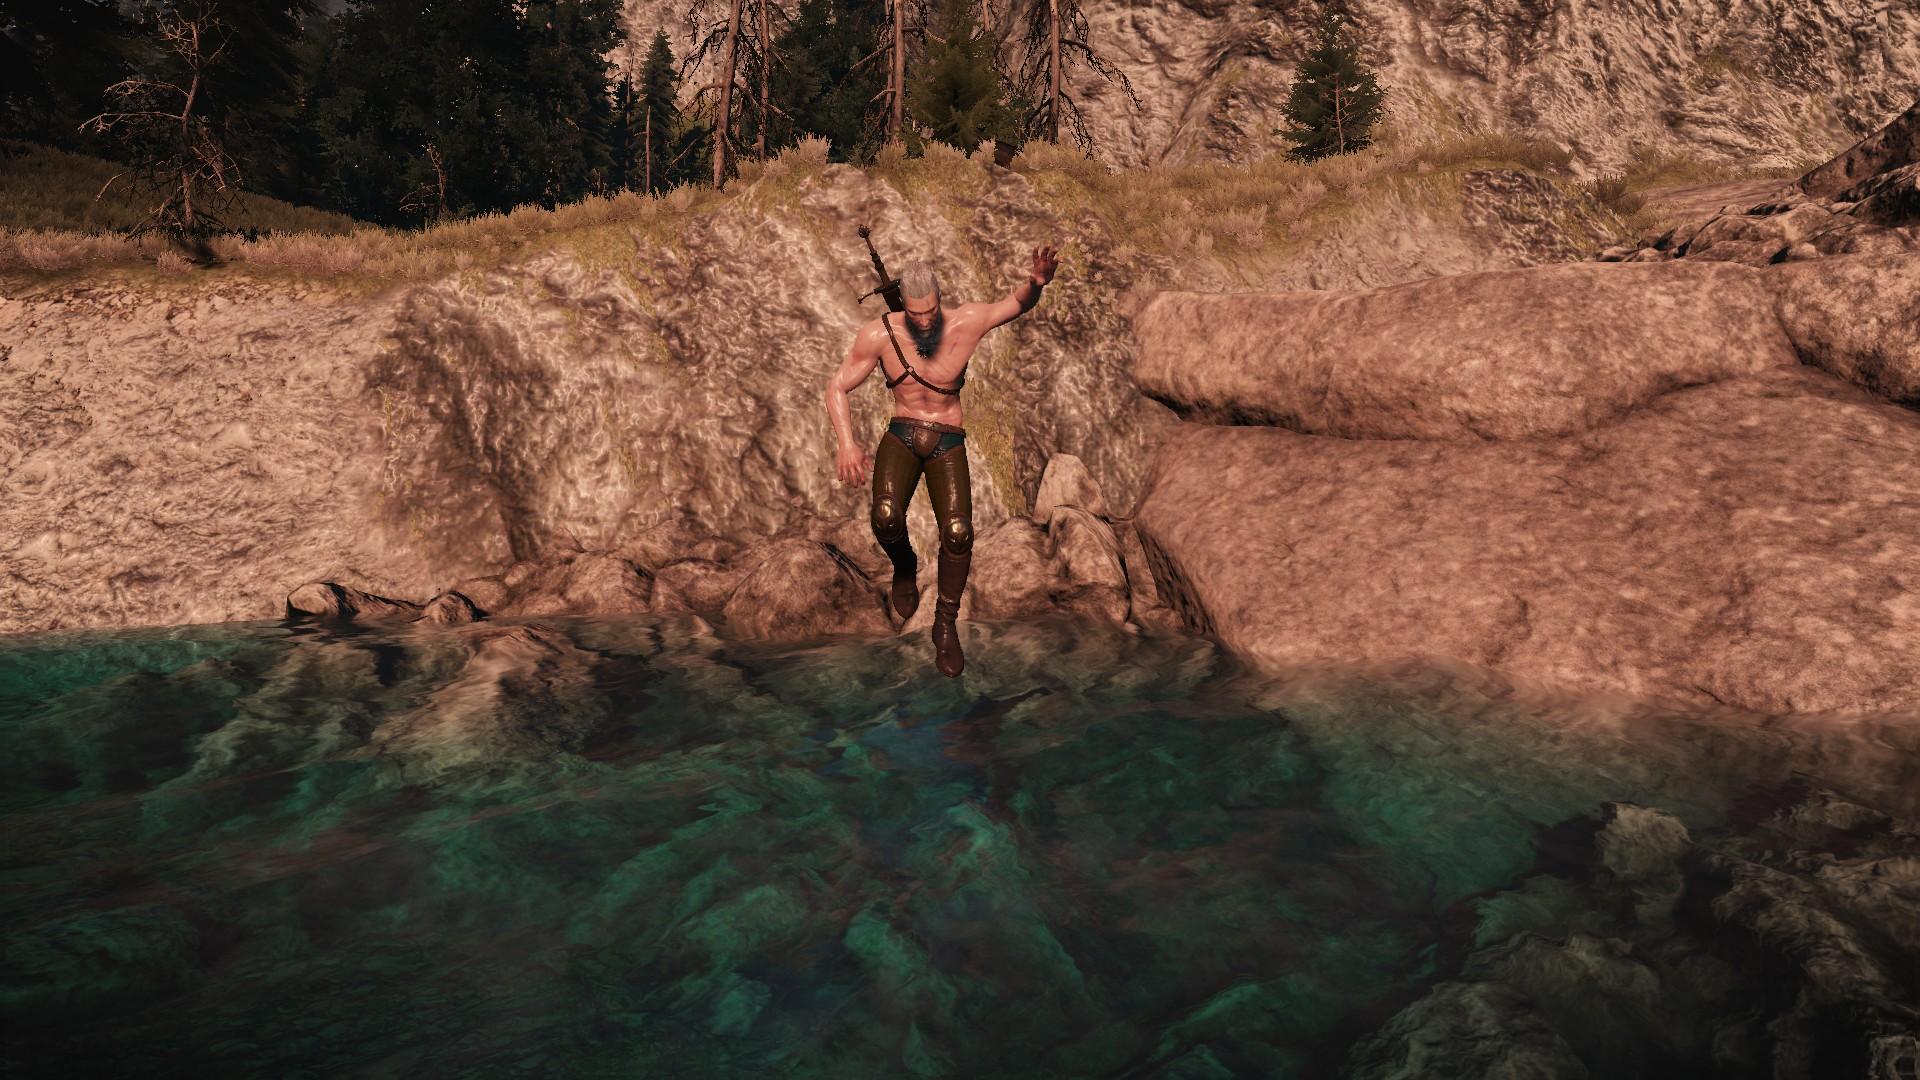 The Witcher 3 Screenshot 2019.02.10 - 20.53.03.33.jpg - Witcher 3: Wild Hunt, the